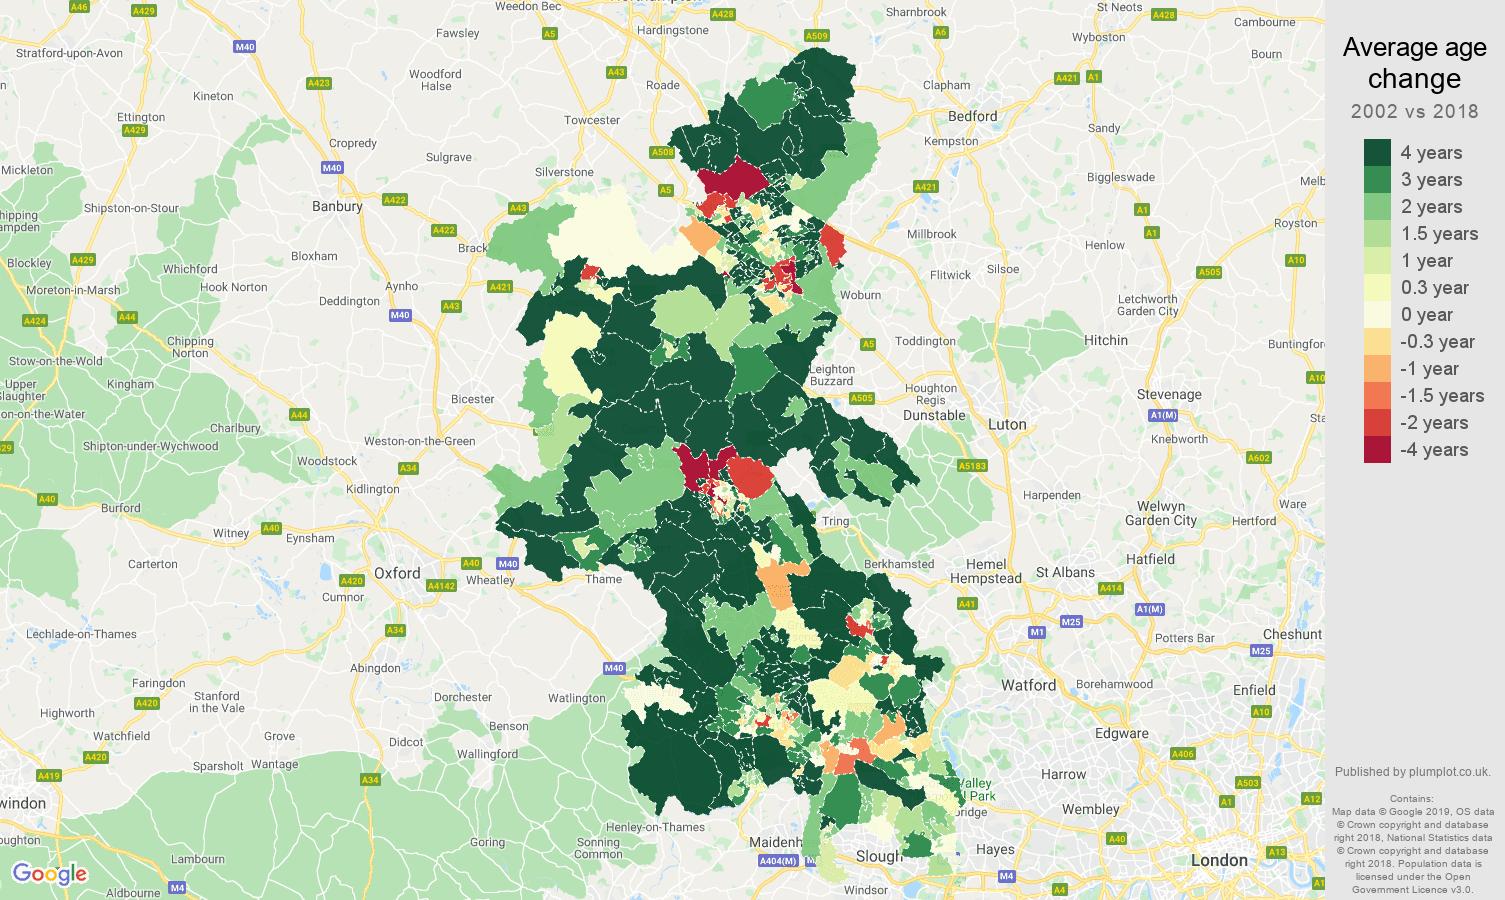 Buckinghamshire average age change map